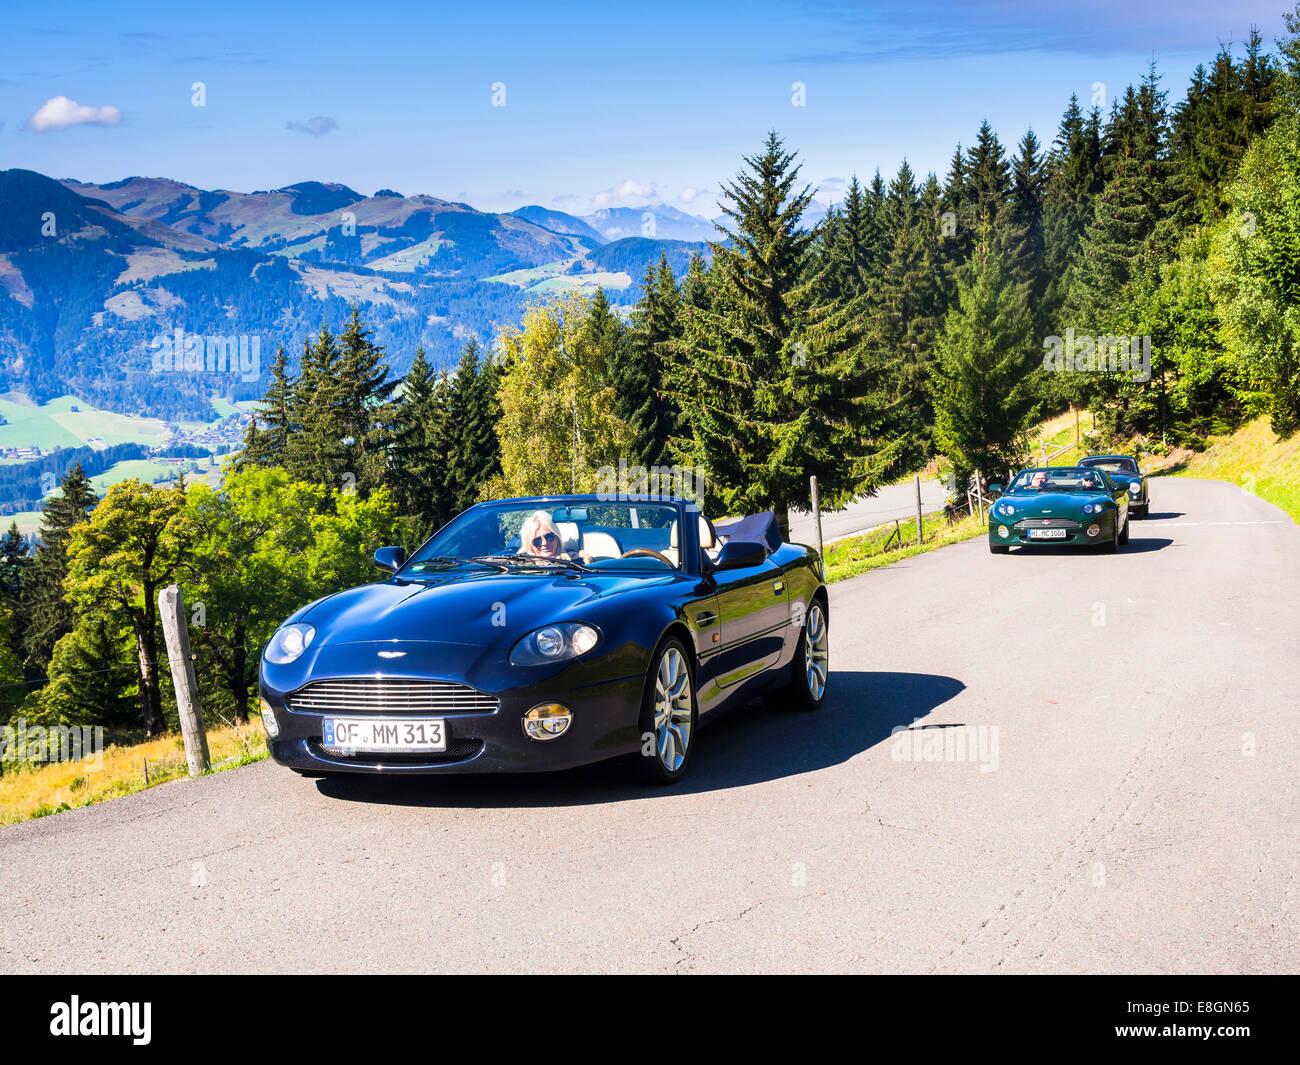 Aston Martin DB7 Vantage Volange cars on a mountain road near Kitzbühel, Tyrol, Austria - Stock Image